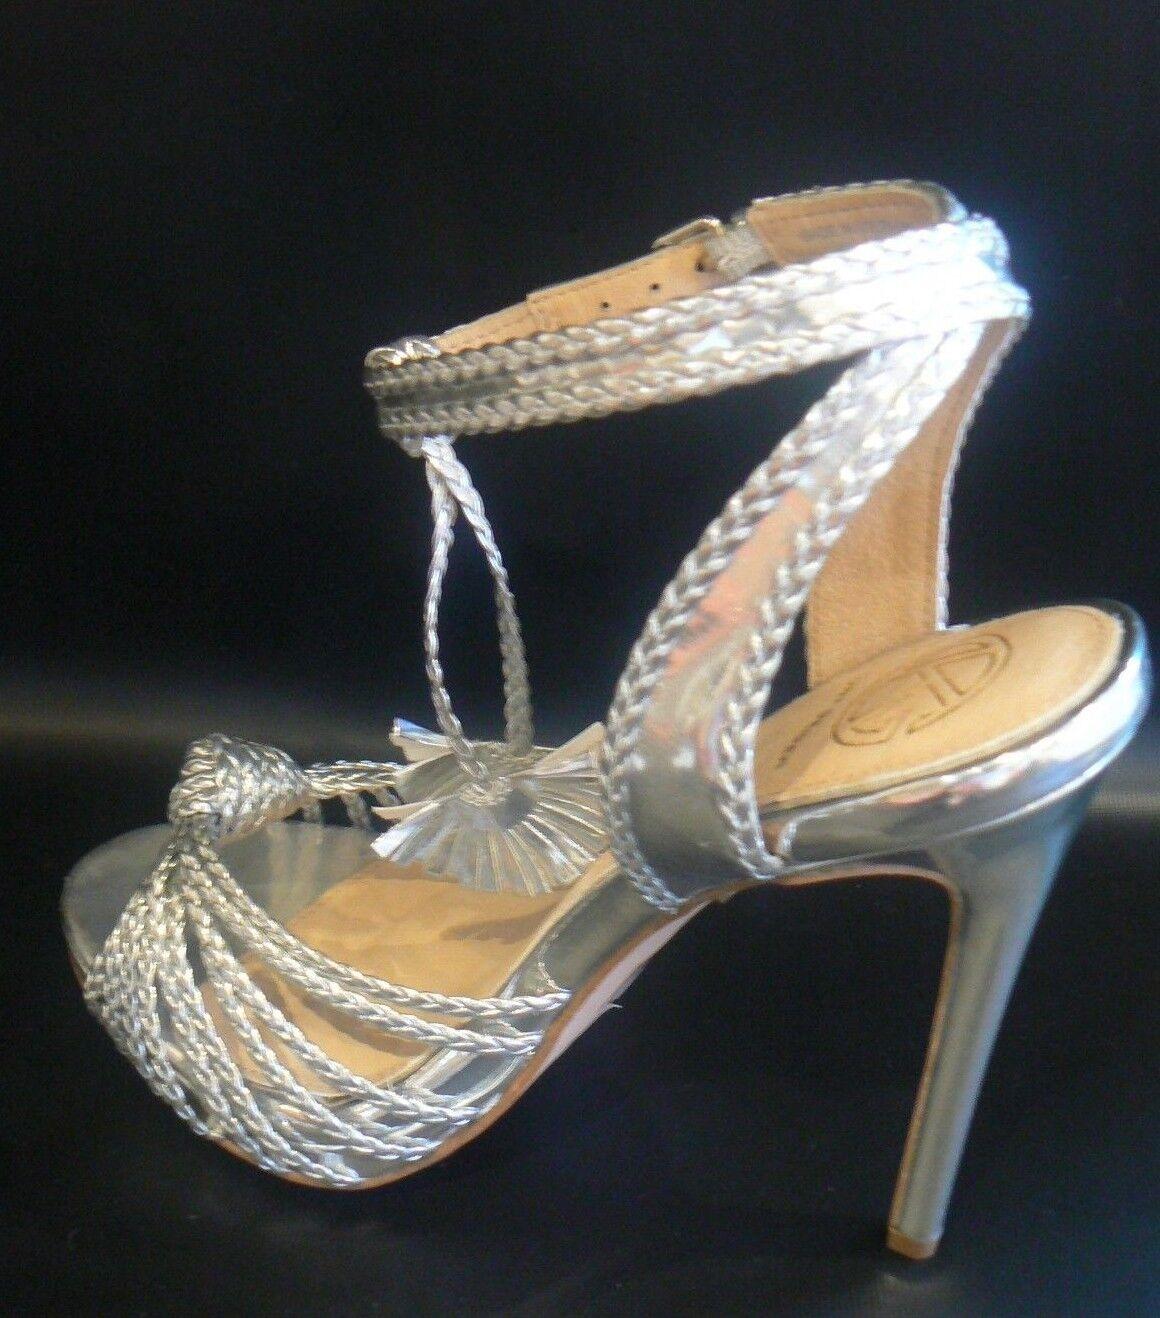 KG Kurt Geiger Hoax in Silver High Heel Sandales in Hoax Silver UK Größe 8 /41 9eb017